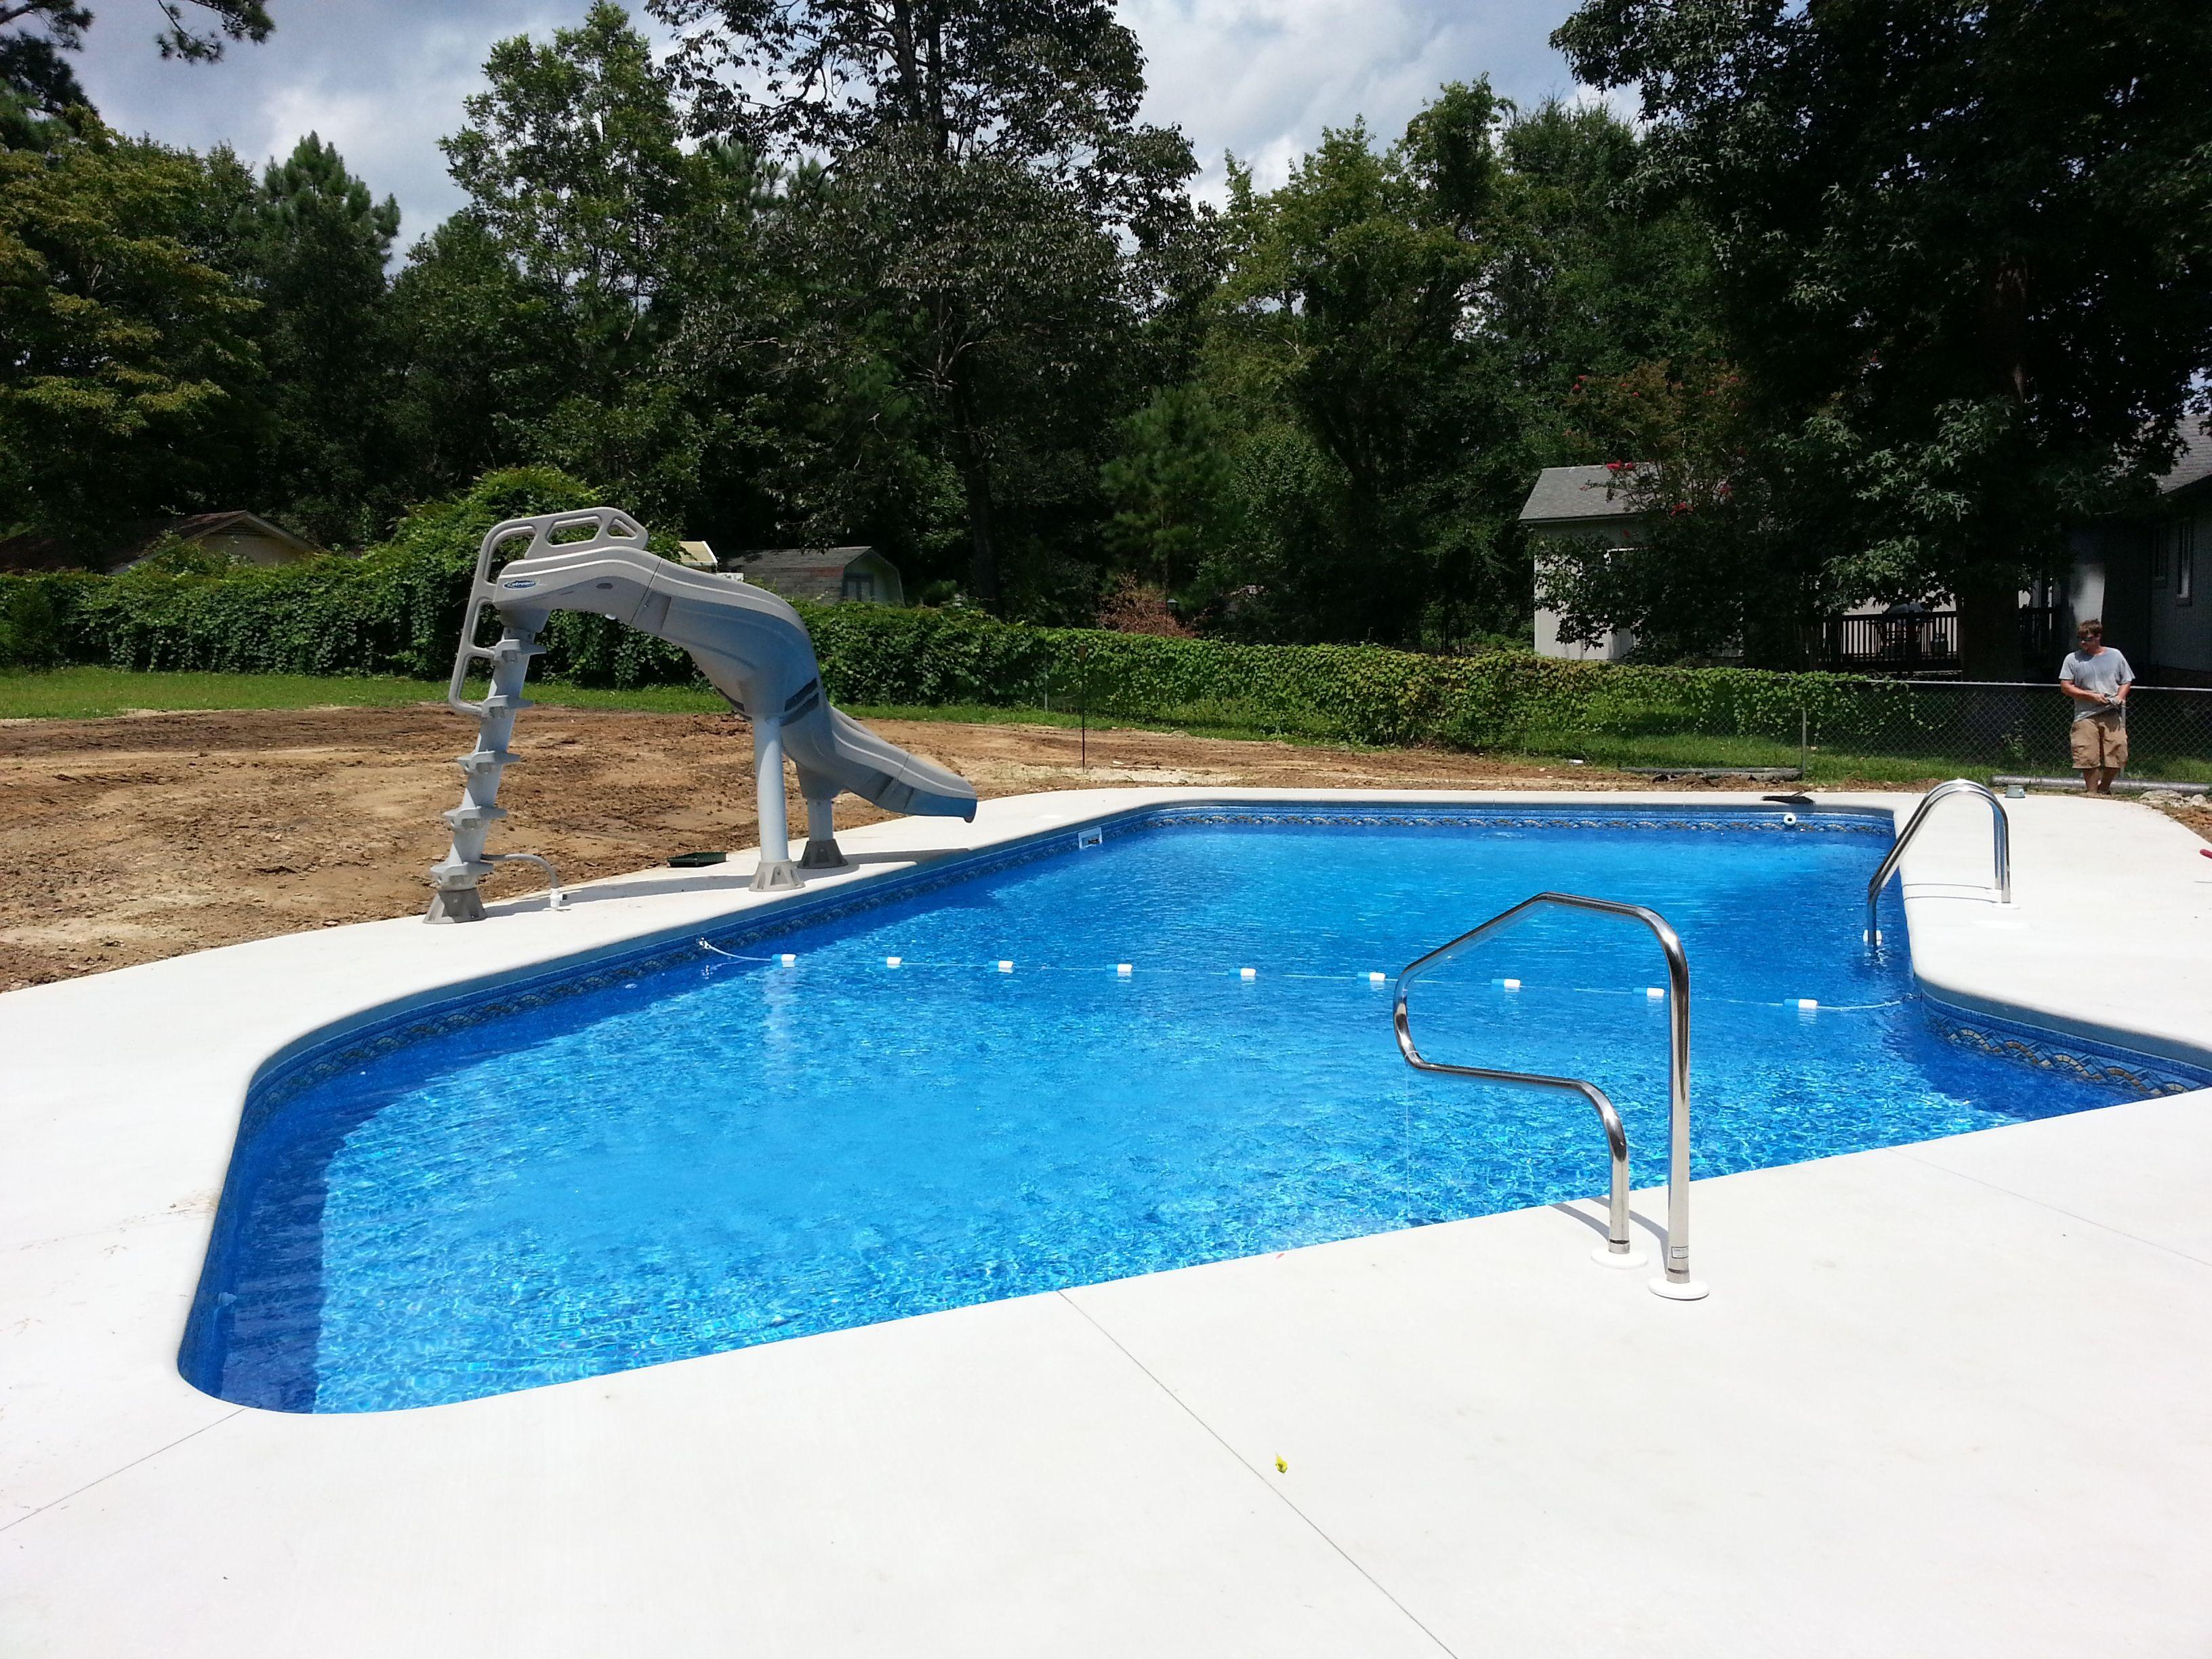 Jfm pools in wilmington nc swimming pool contractors for Pool dealers